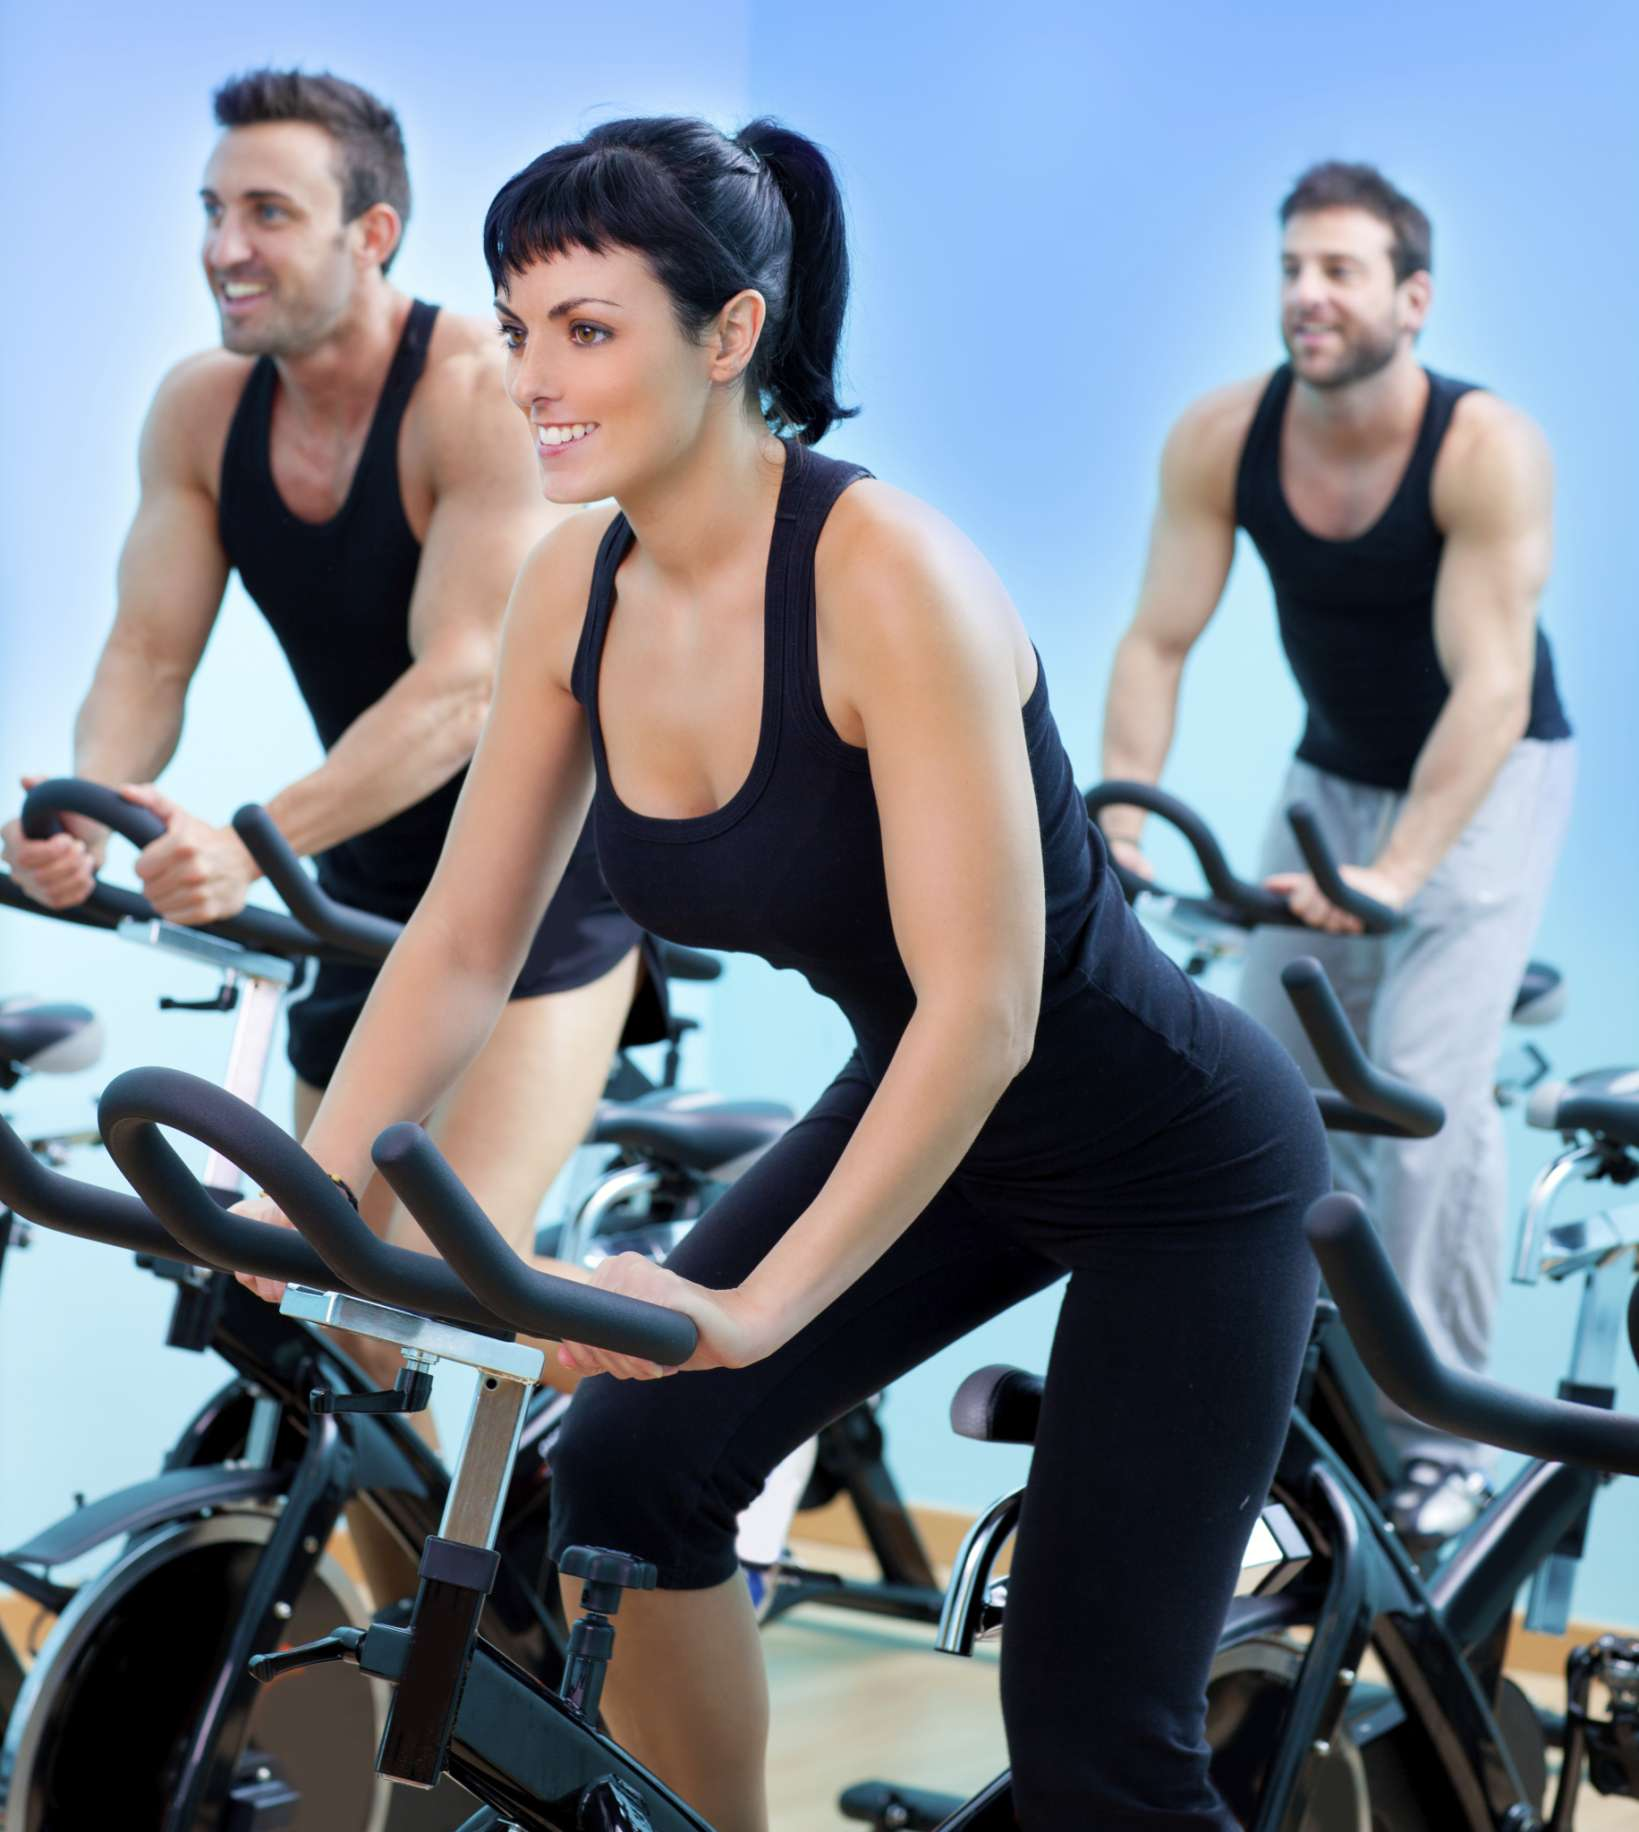 bicicleta, ciclismo, mujer, ejercicio, salud Foto: Thinkstock